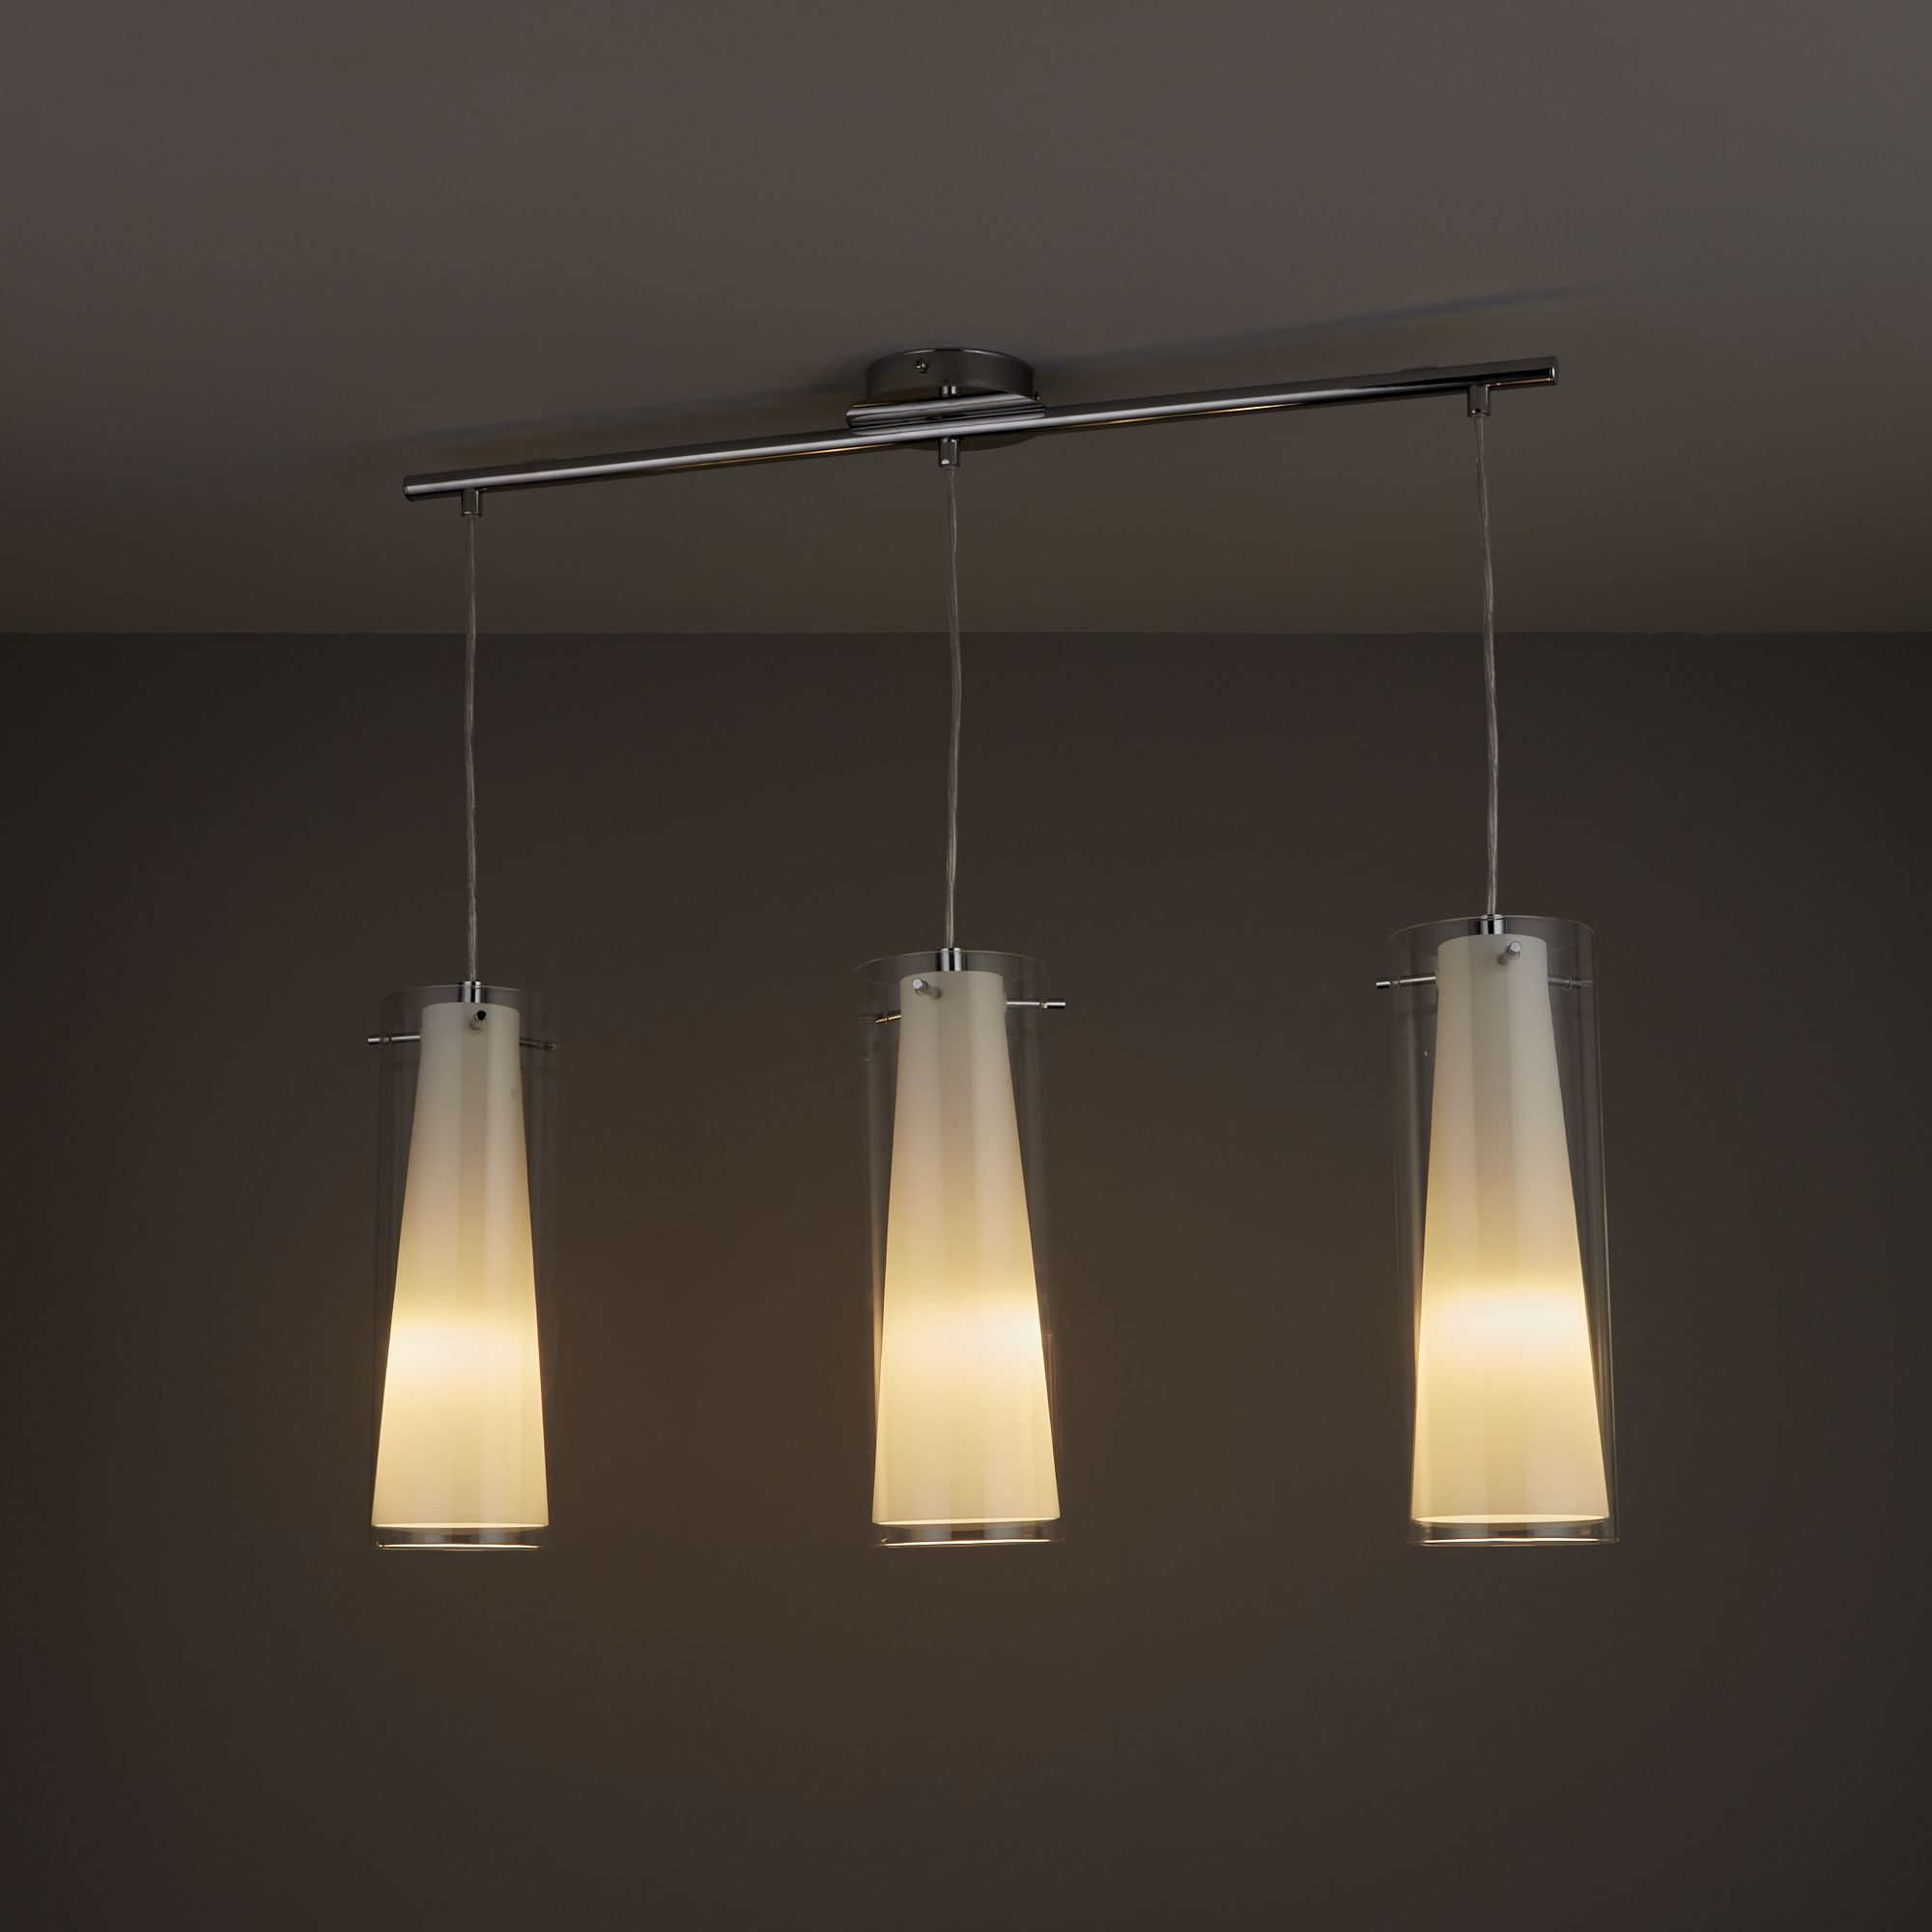 Kamara Tube White 3 Lamp Pendant Ceiling Light | Departments | DIY at B&Q